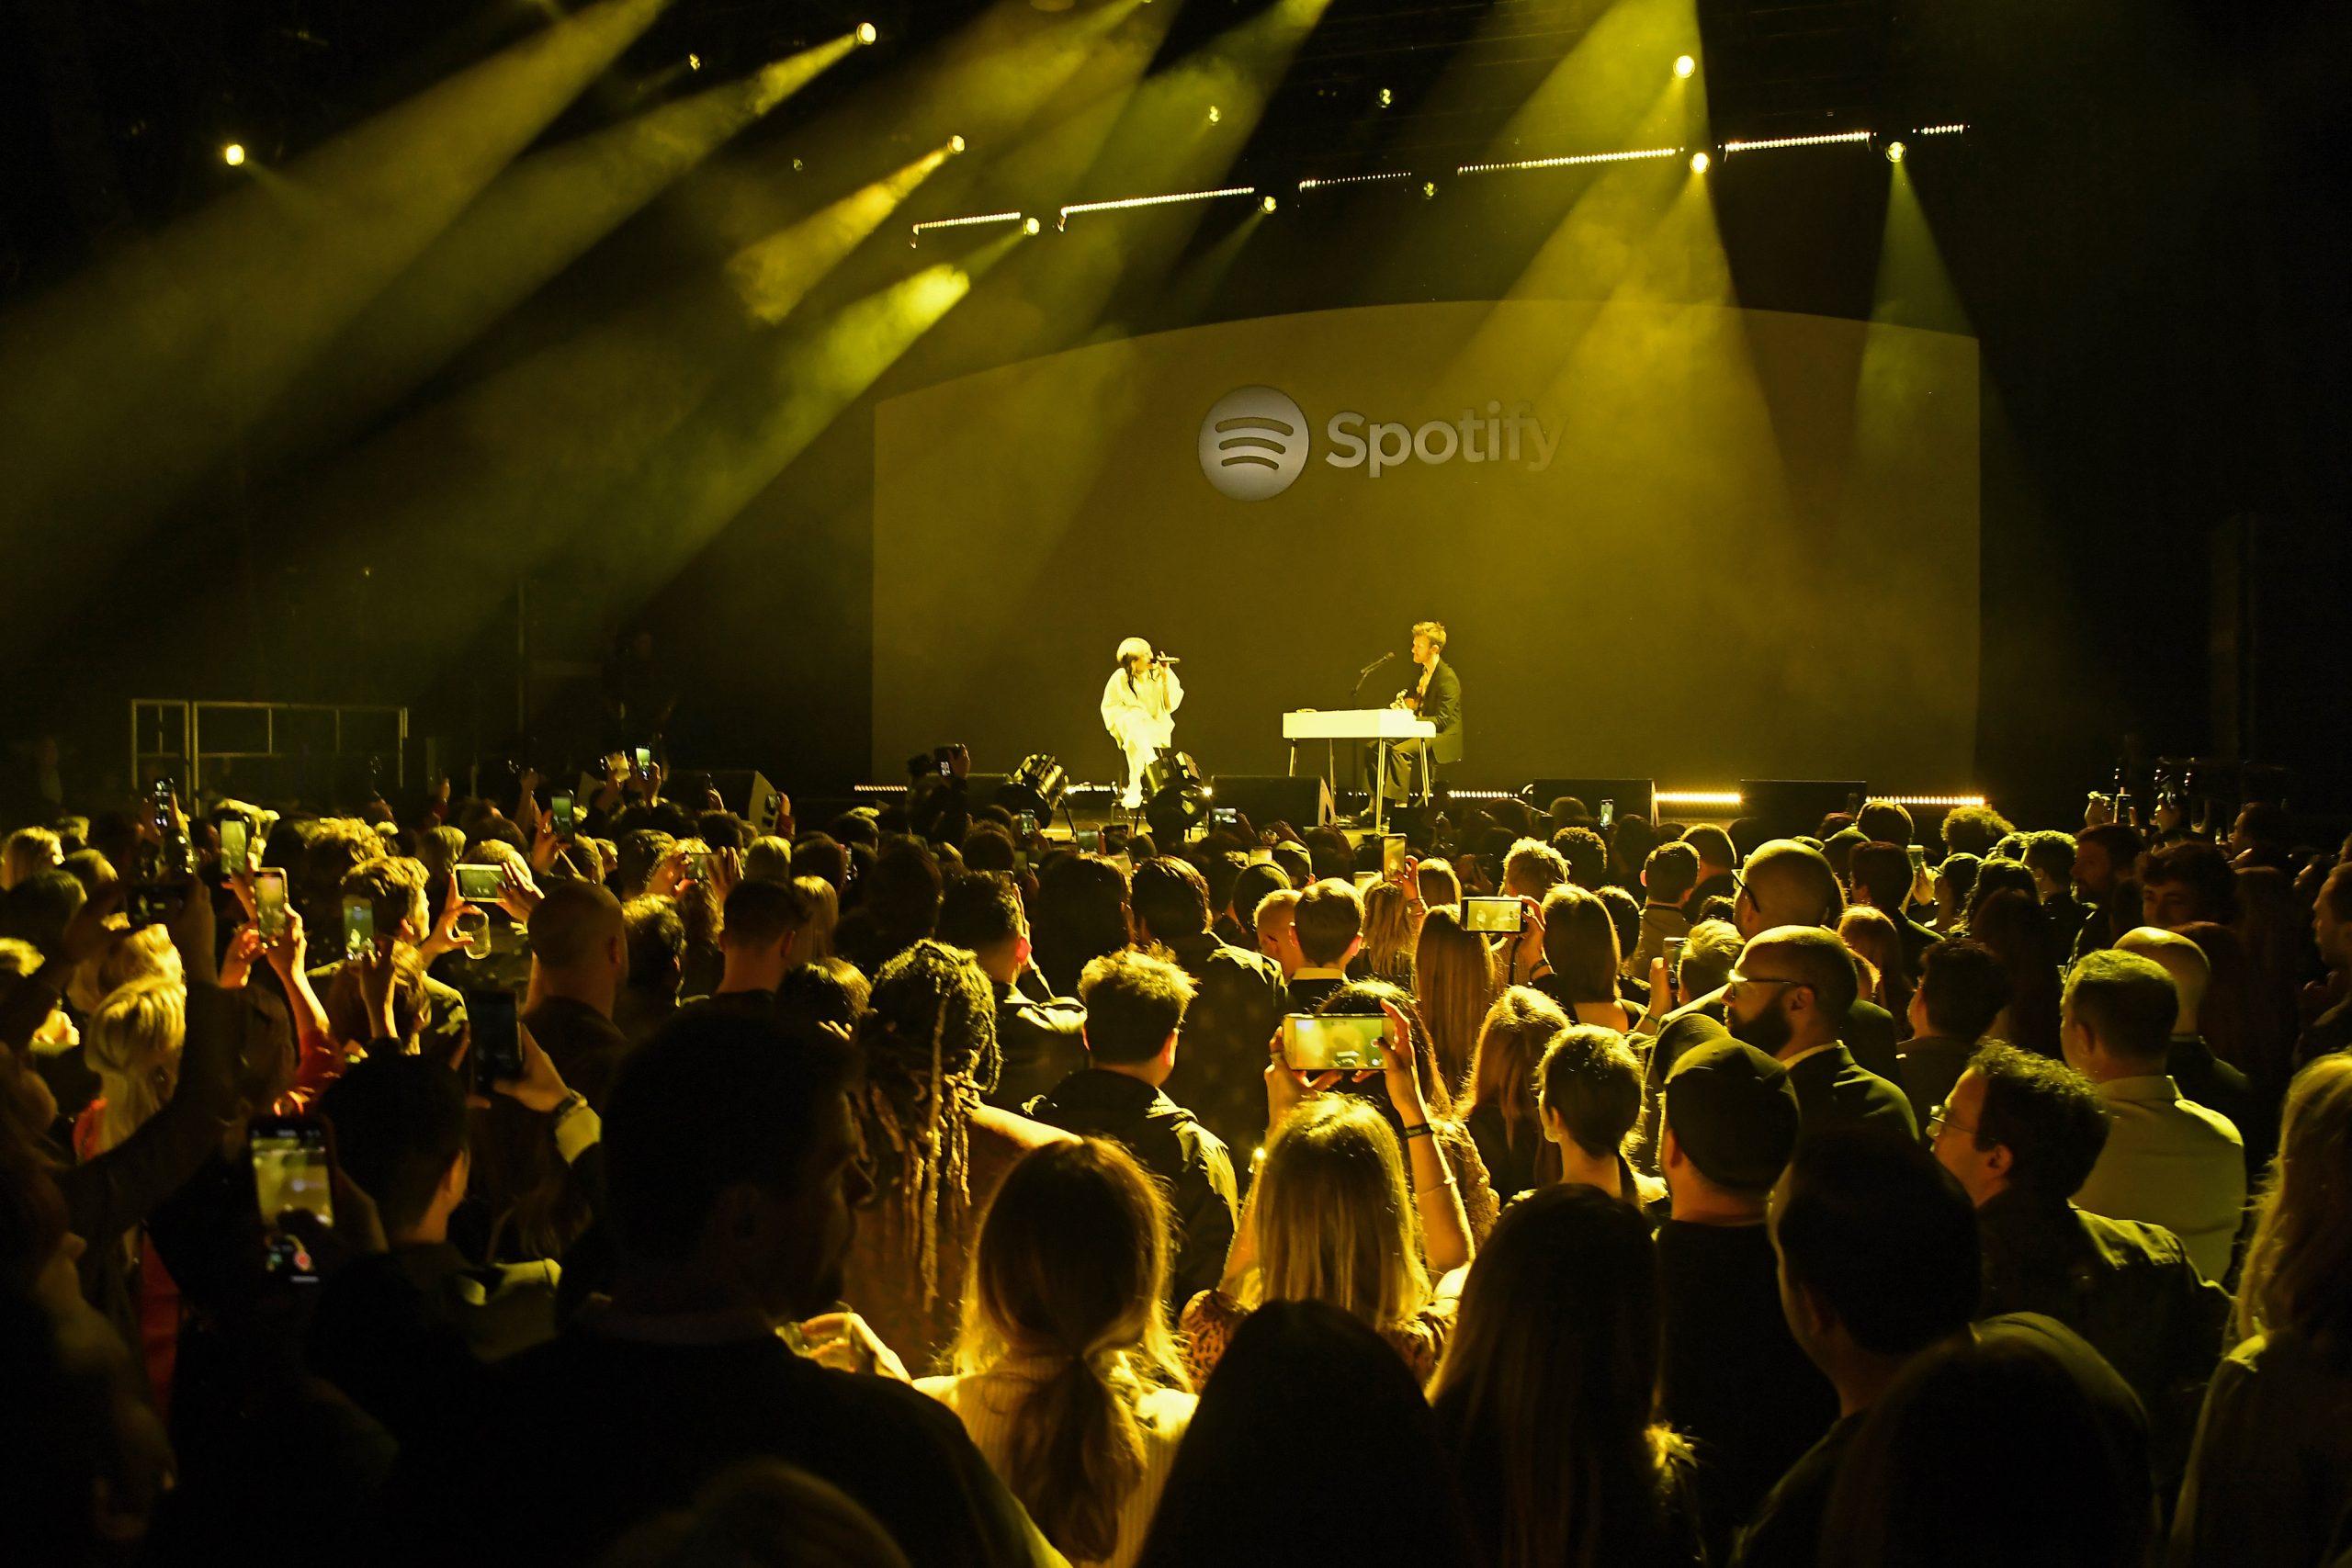 Spotify Best New Artist